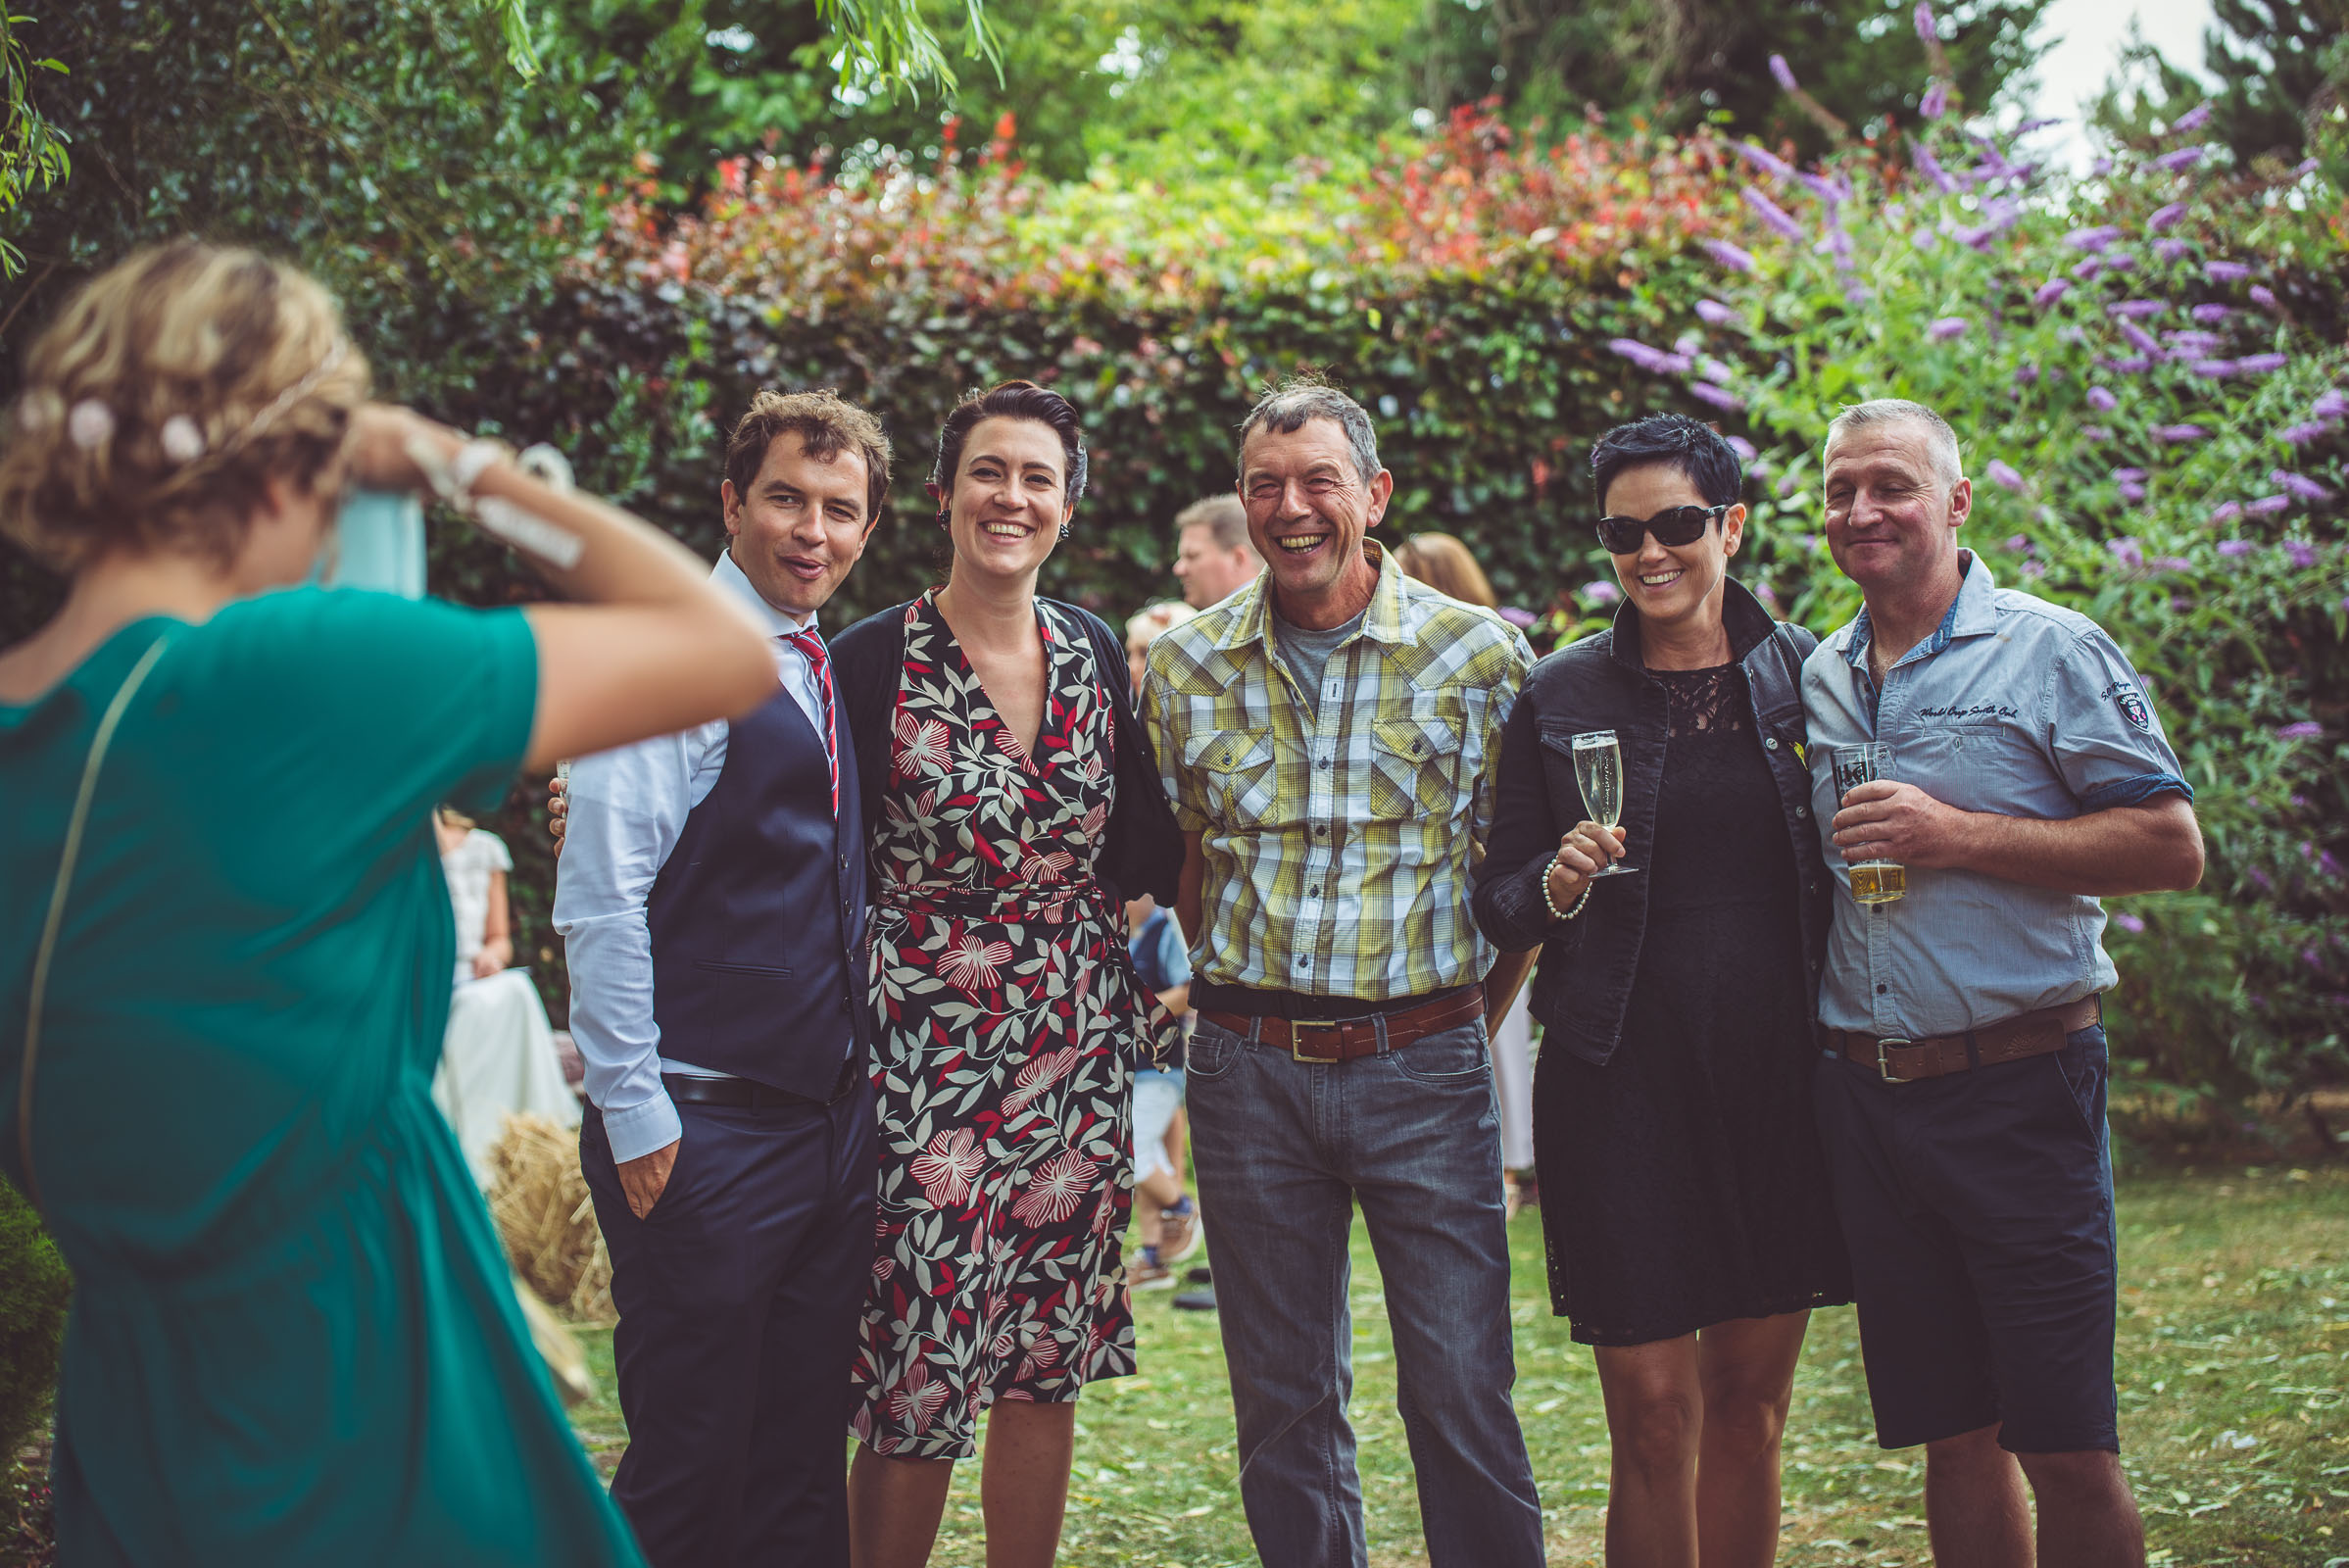 Hitchin_wedding_St_Pauls_Waldenbury_Royston_Wedding_Photographer-54.jpg